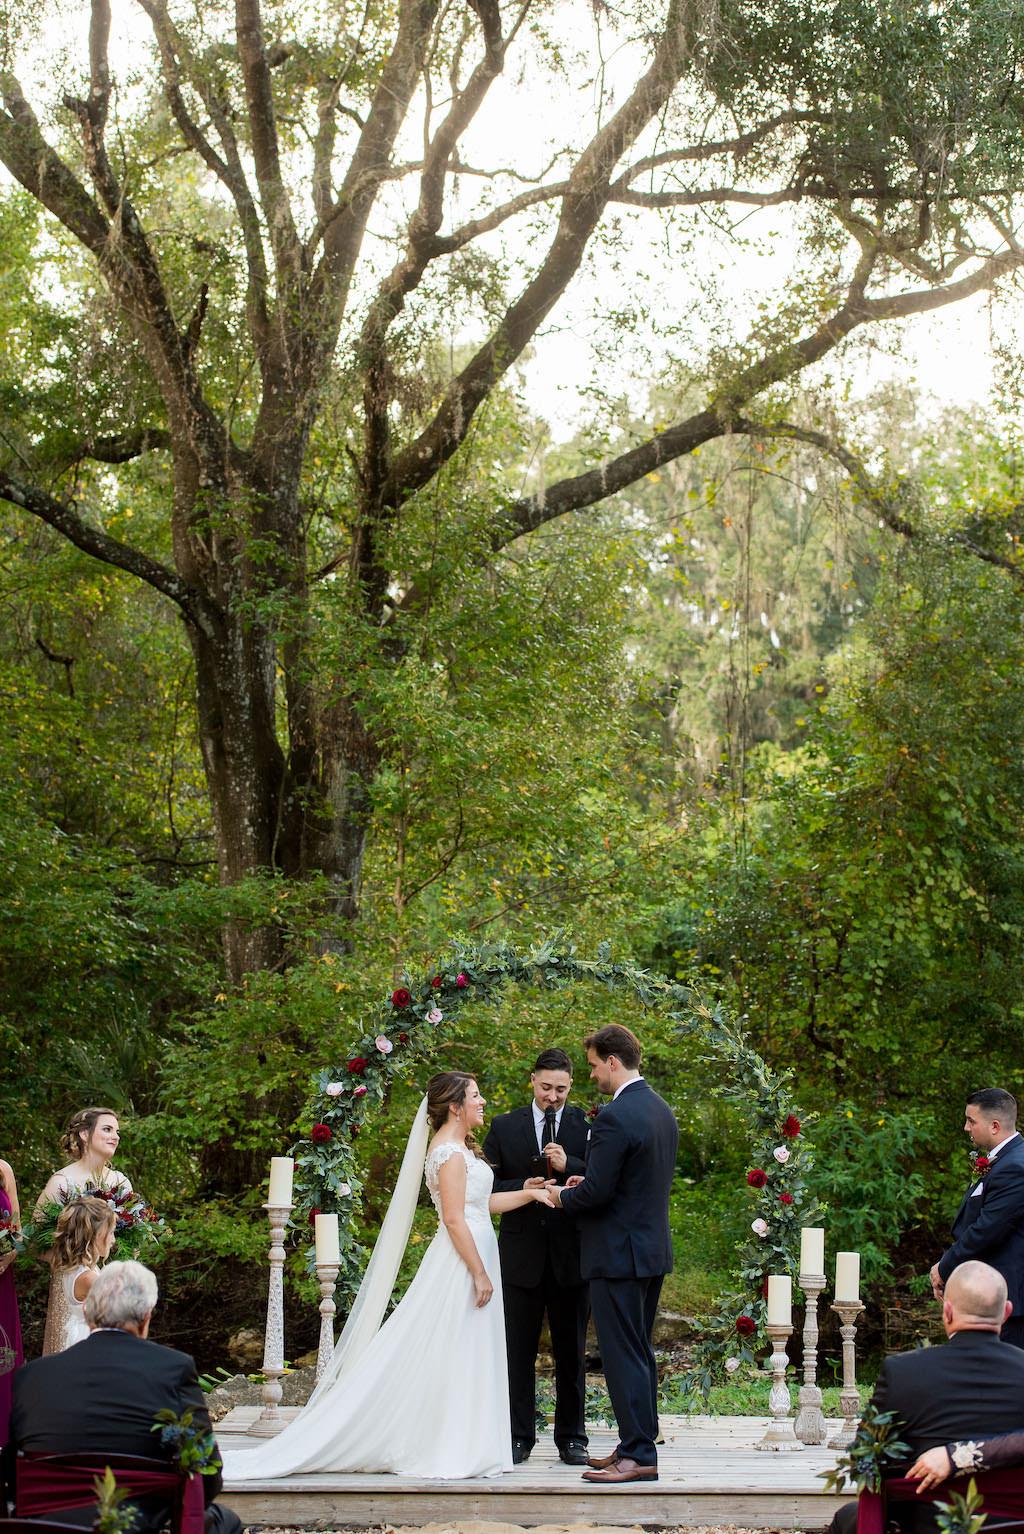 Florida Bride and Groom Exchanging Vows at Rustic Outdoor Garden Wedding Ceremony | Rustic Plant City Wedding Venue Kathleen's Garden